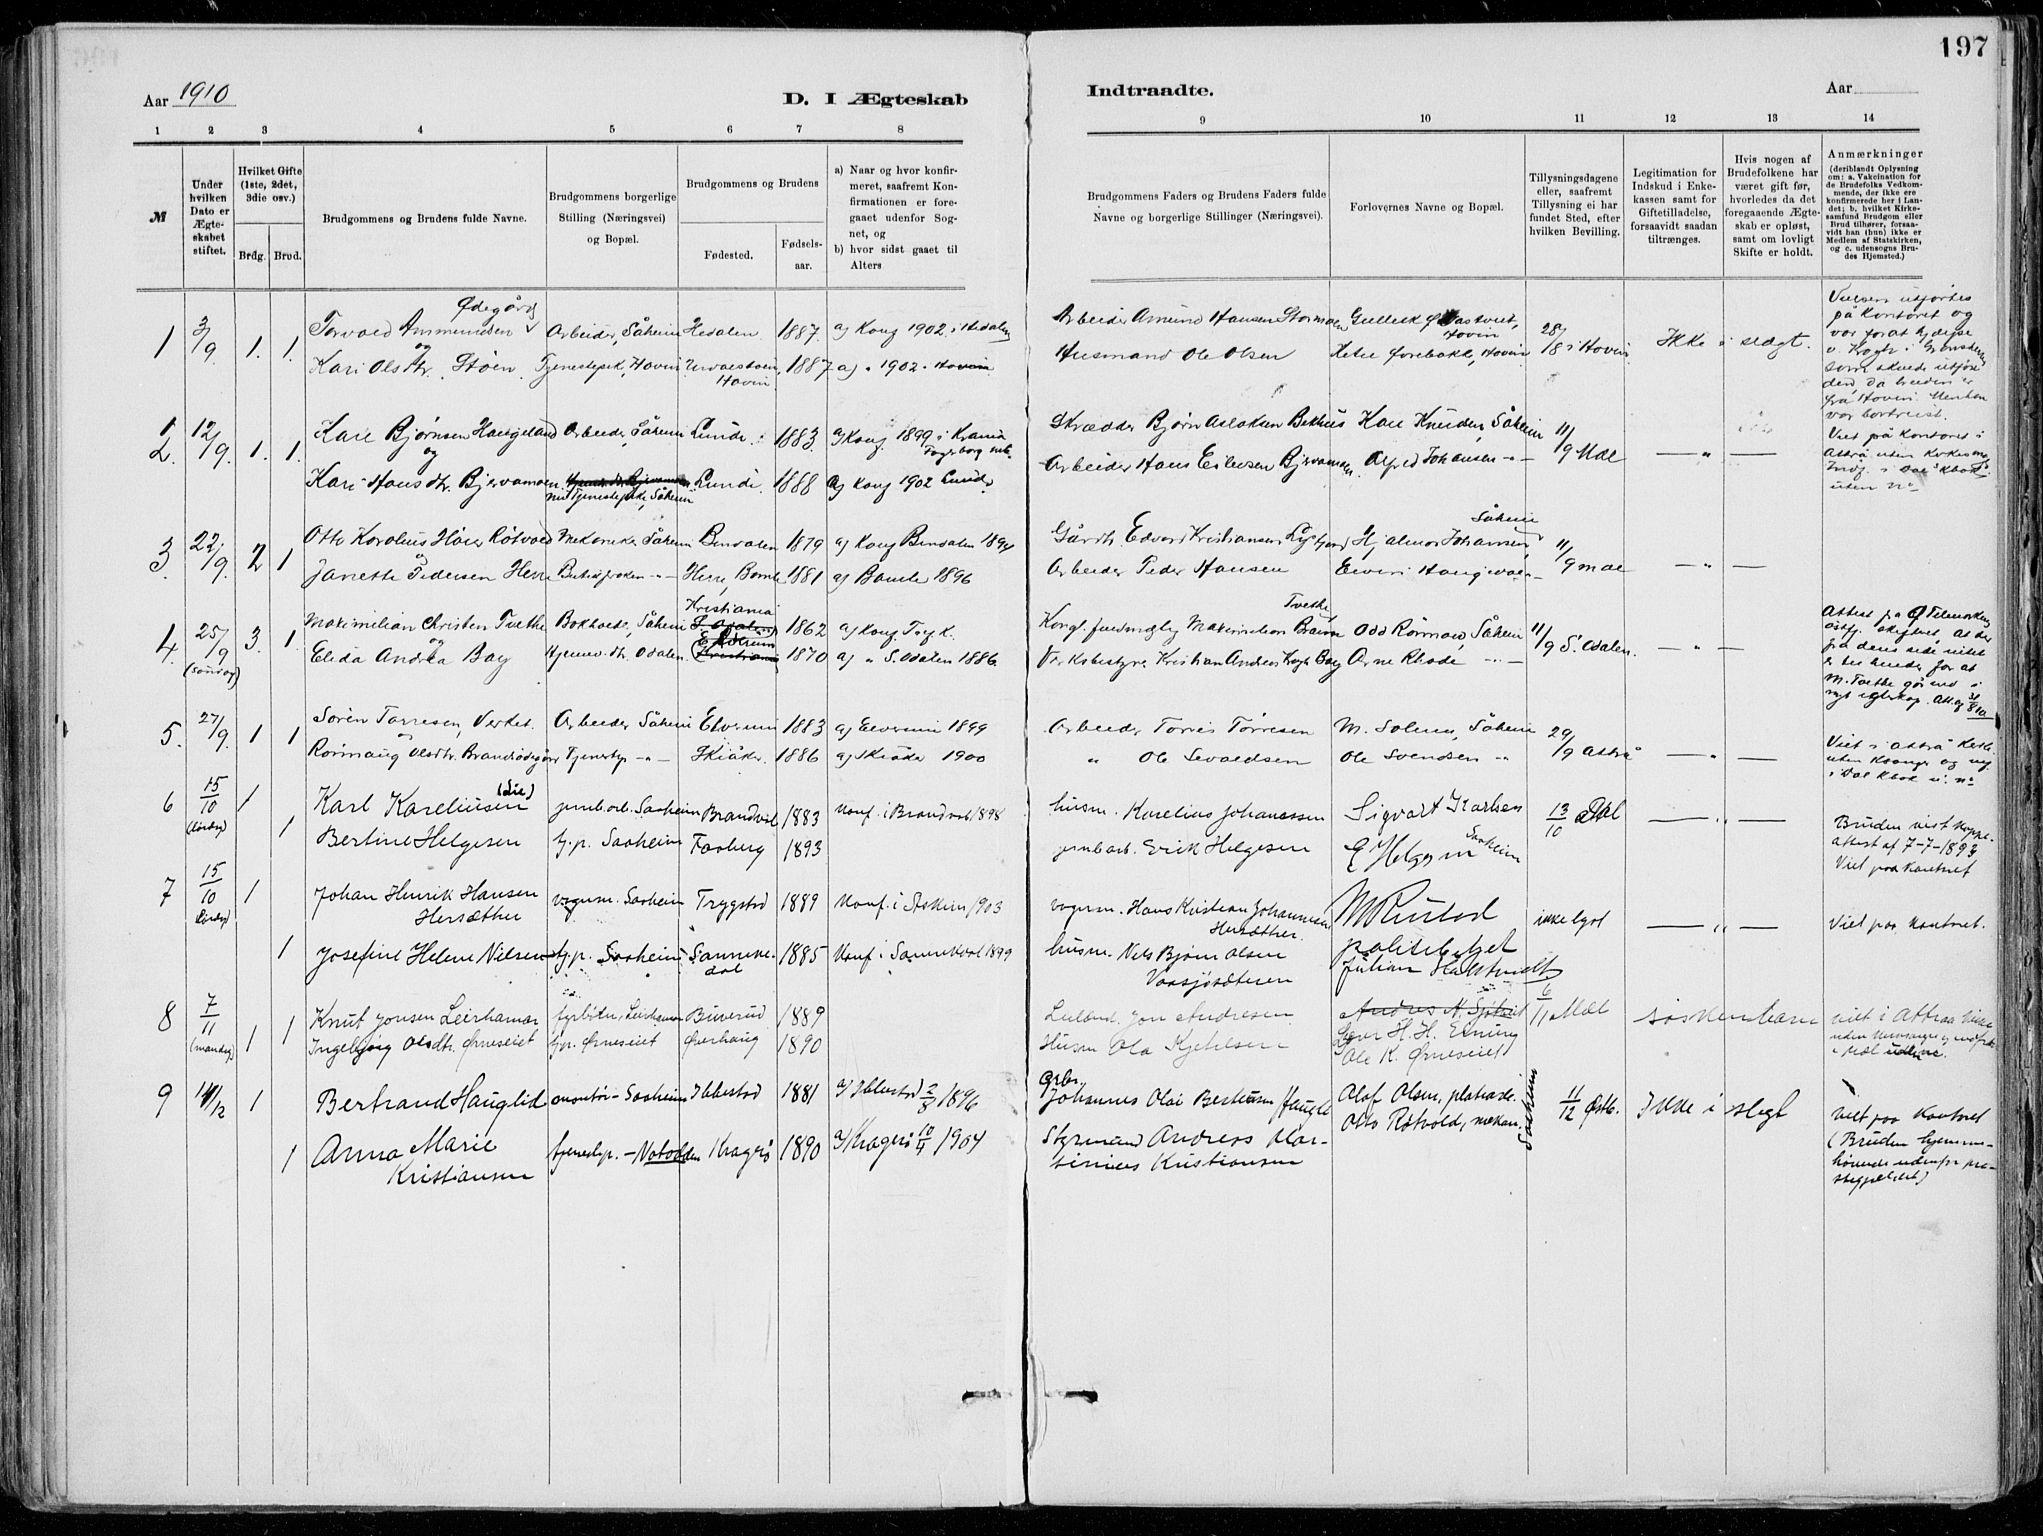 SAKO, Tinn kirkebøker, F/Fa/L0007: Ministerialbok nr. I 7, 1878-1922, s. 197